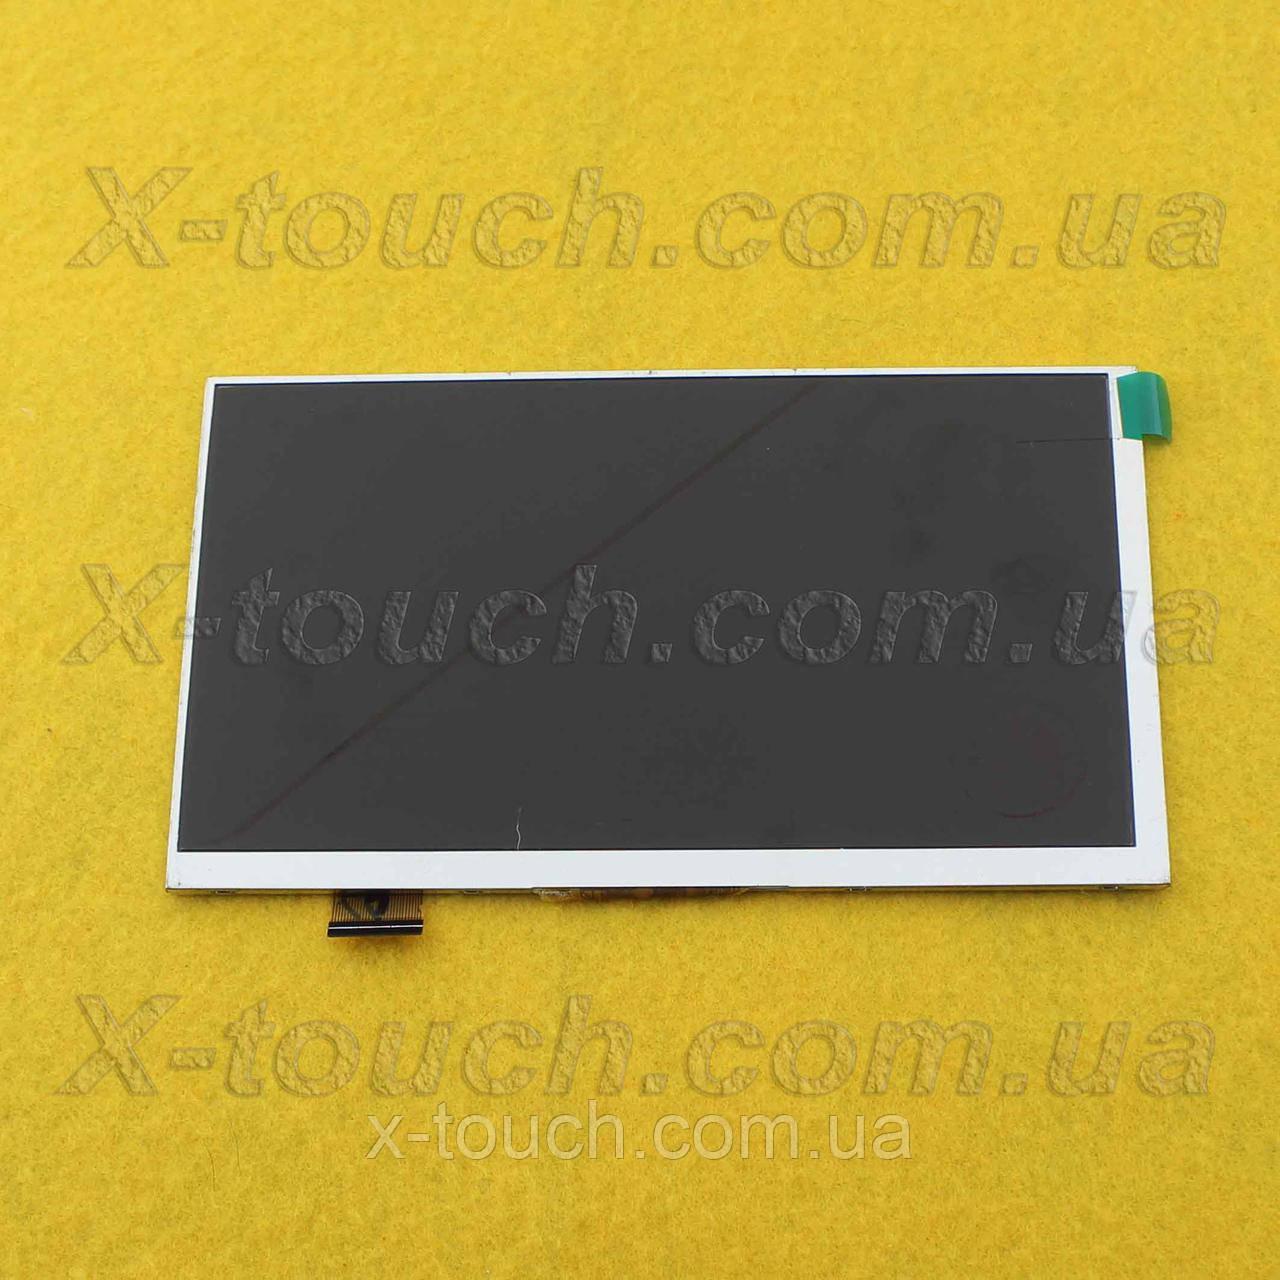 Матриця,екран, дисплей 1030301065 для планшета